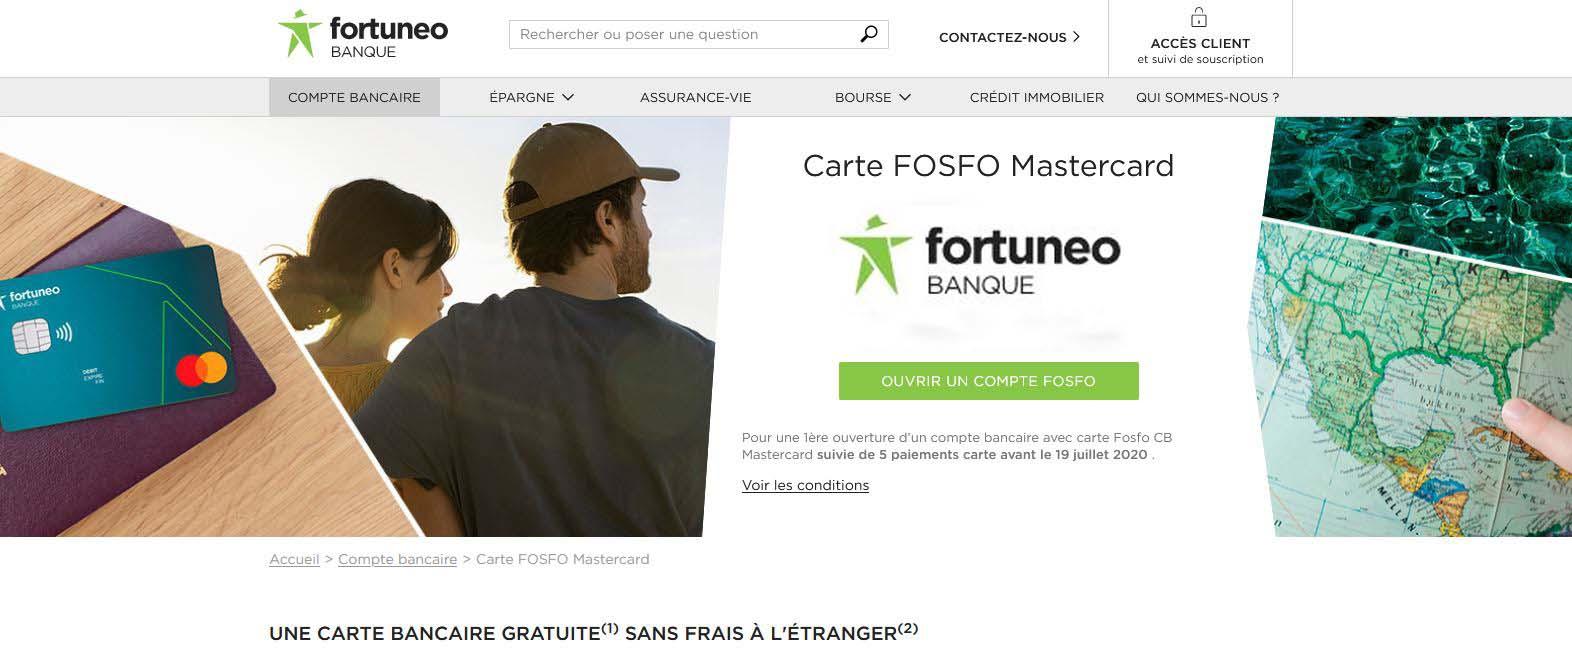 L'offre Fosfo de Fortuneo